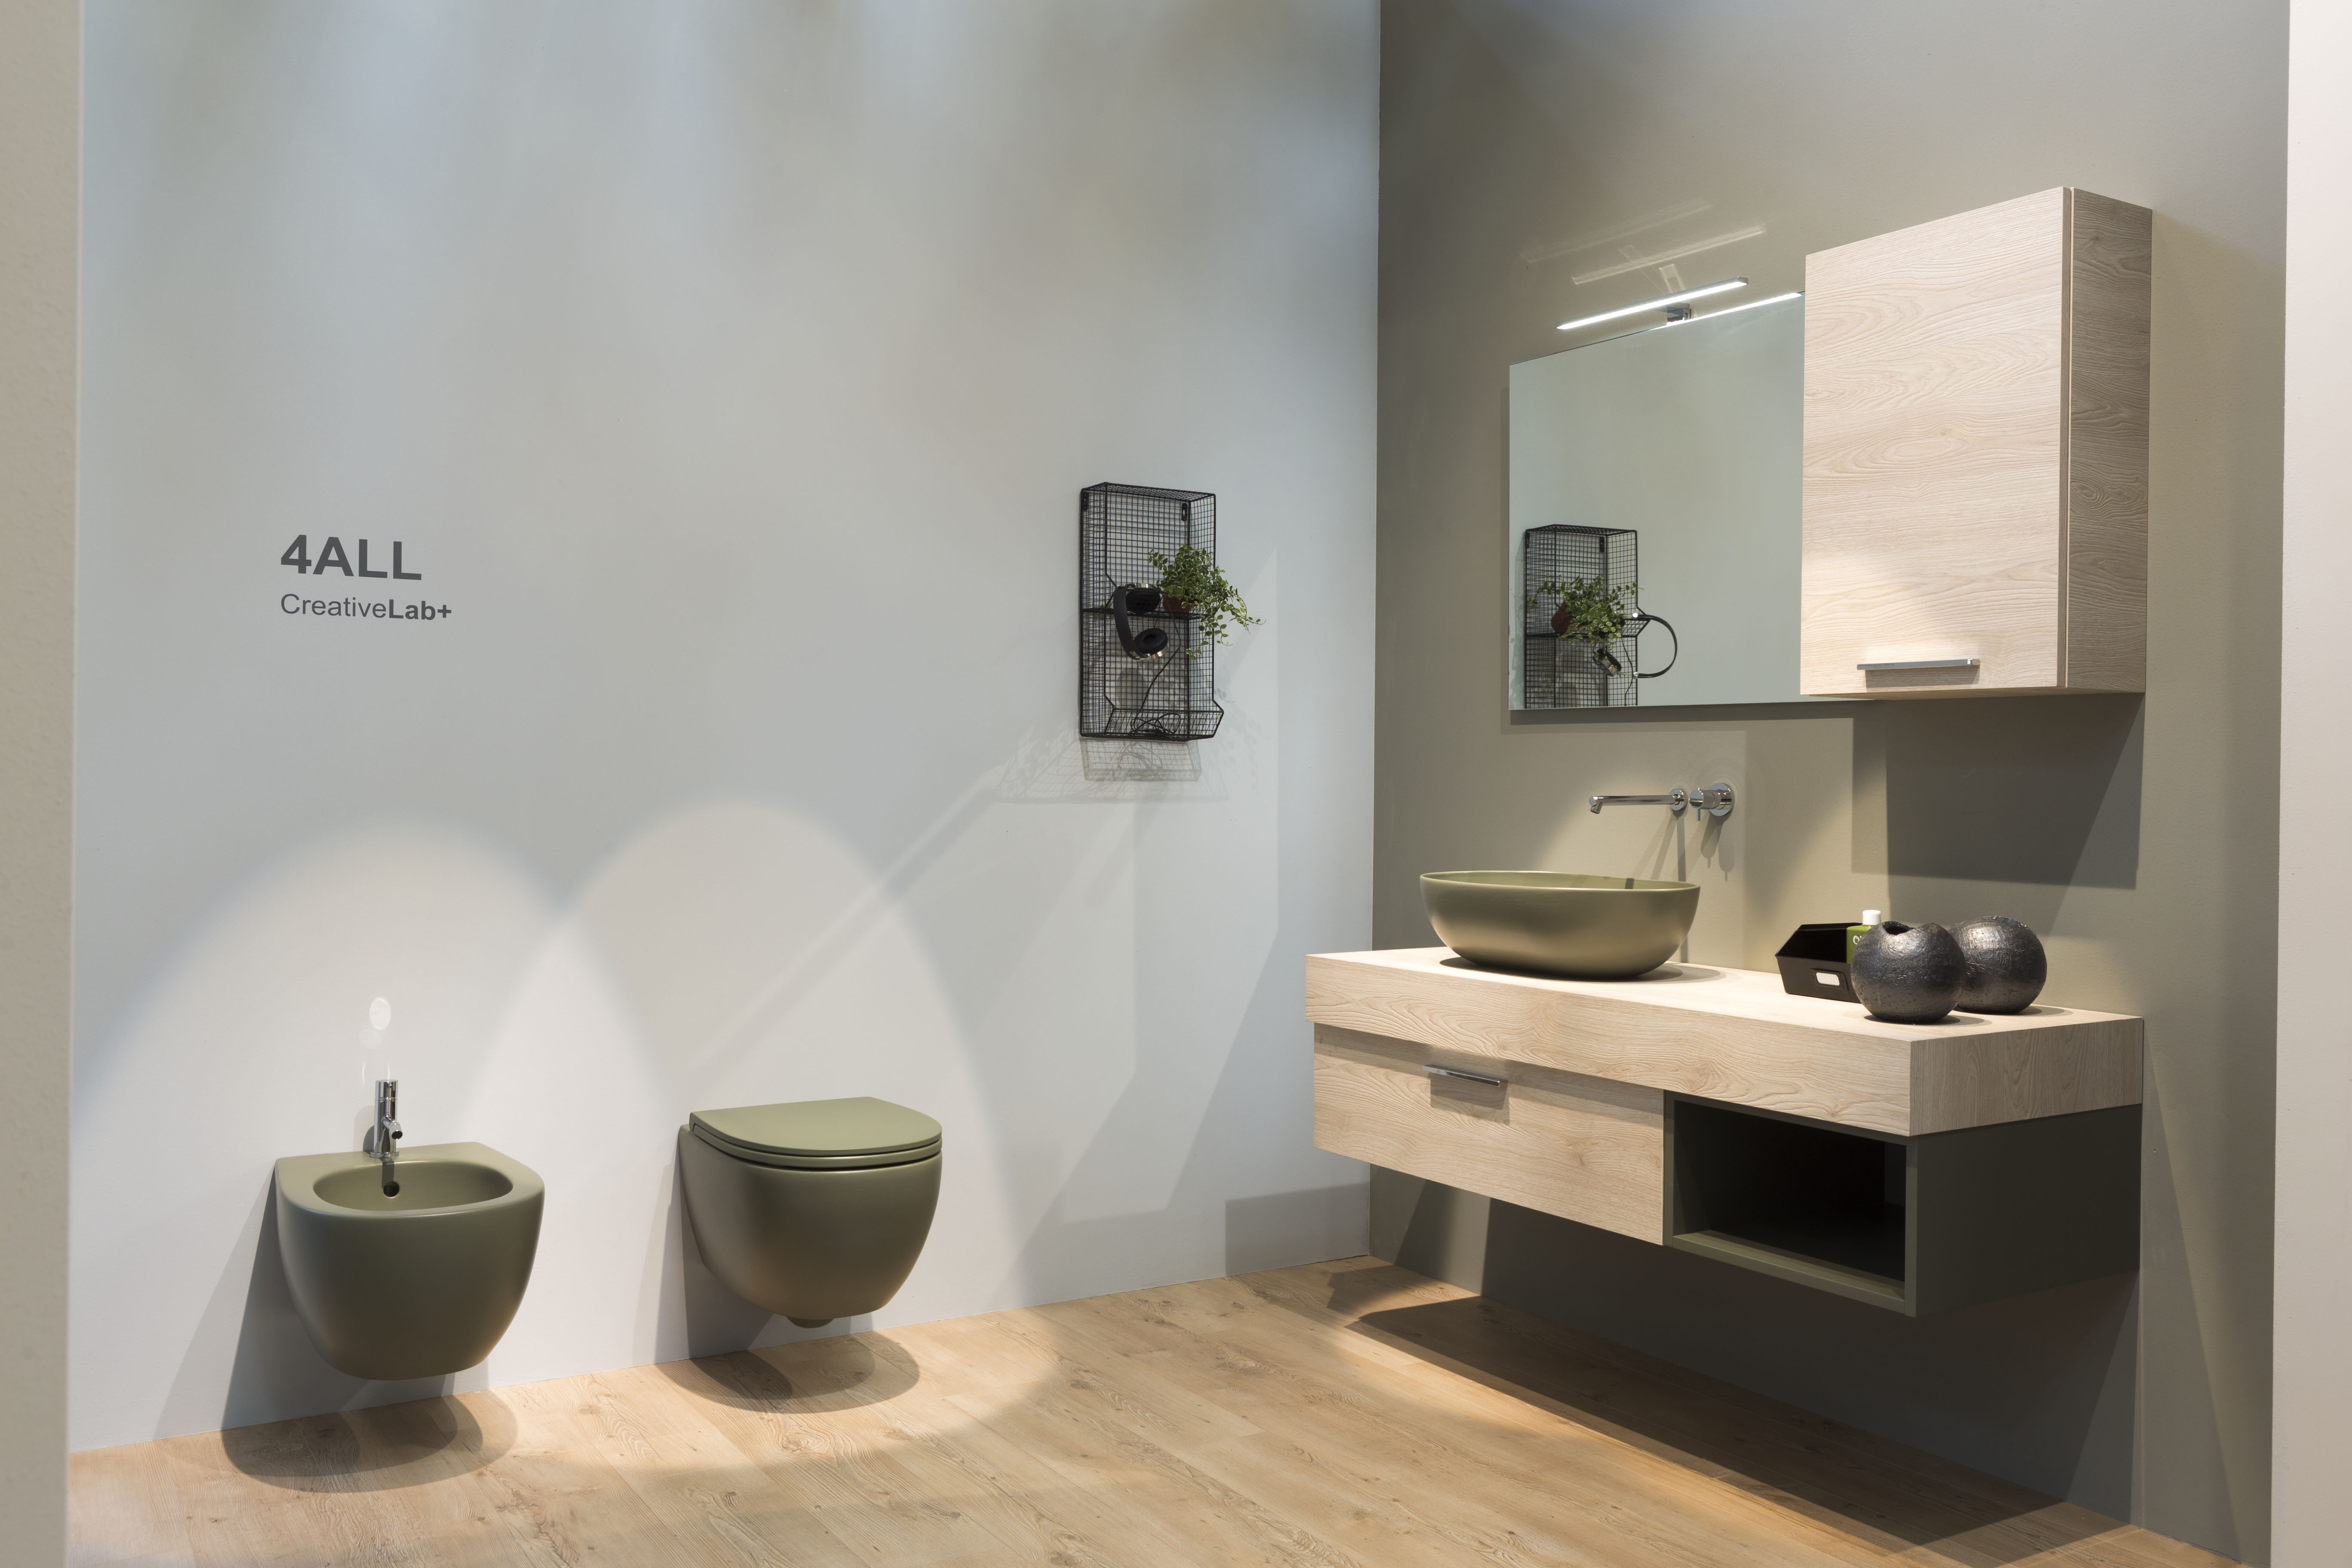 Arredo Bagno Globo : I lavabi integrati di ceramica globo a cersaie